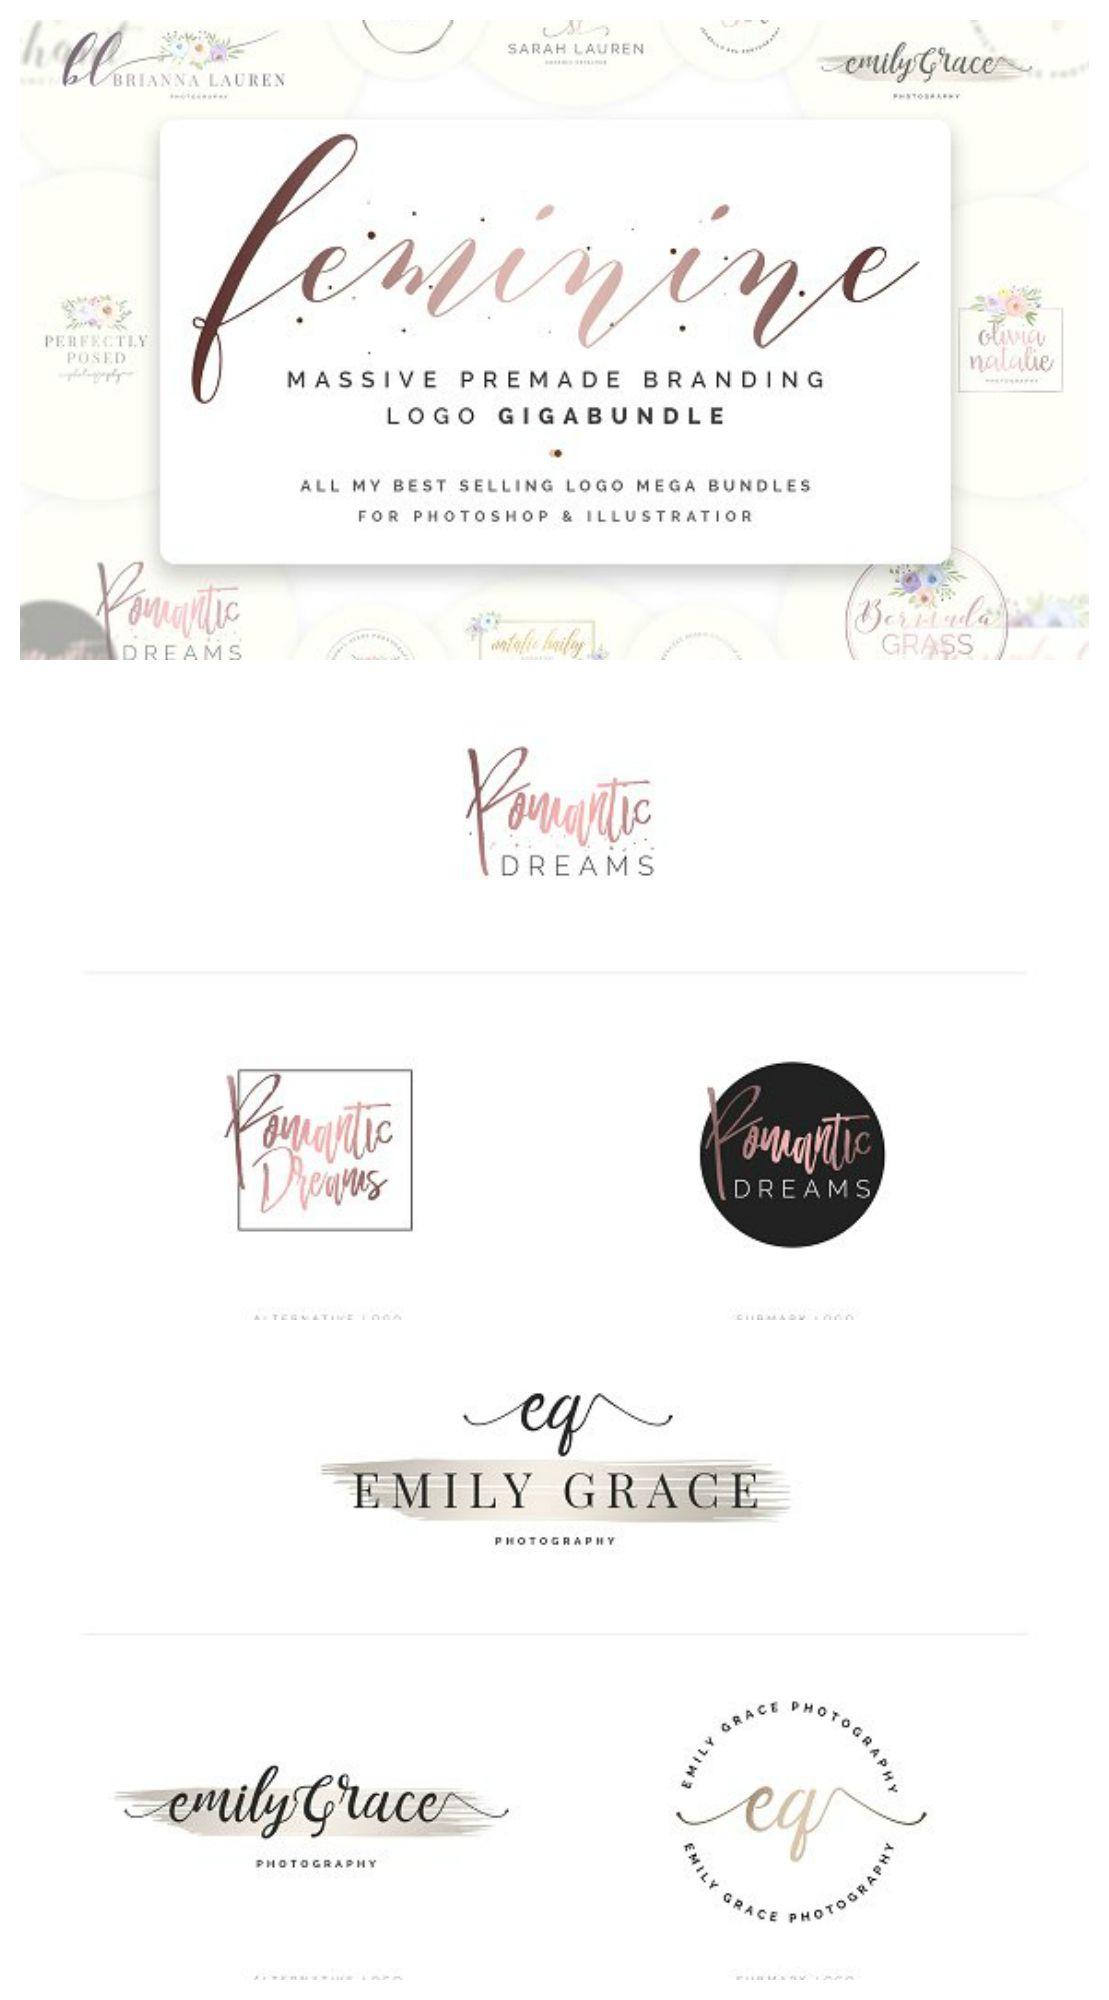 Feminine Premade Logo Gigabundle  Worth Of Best Selling